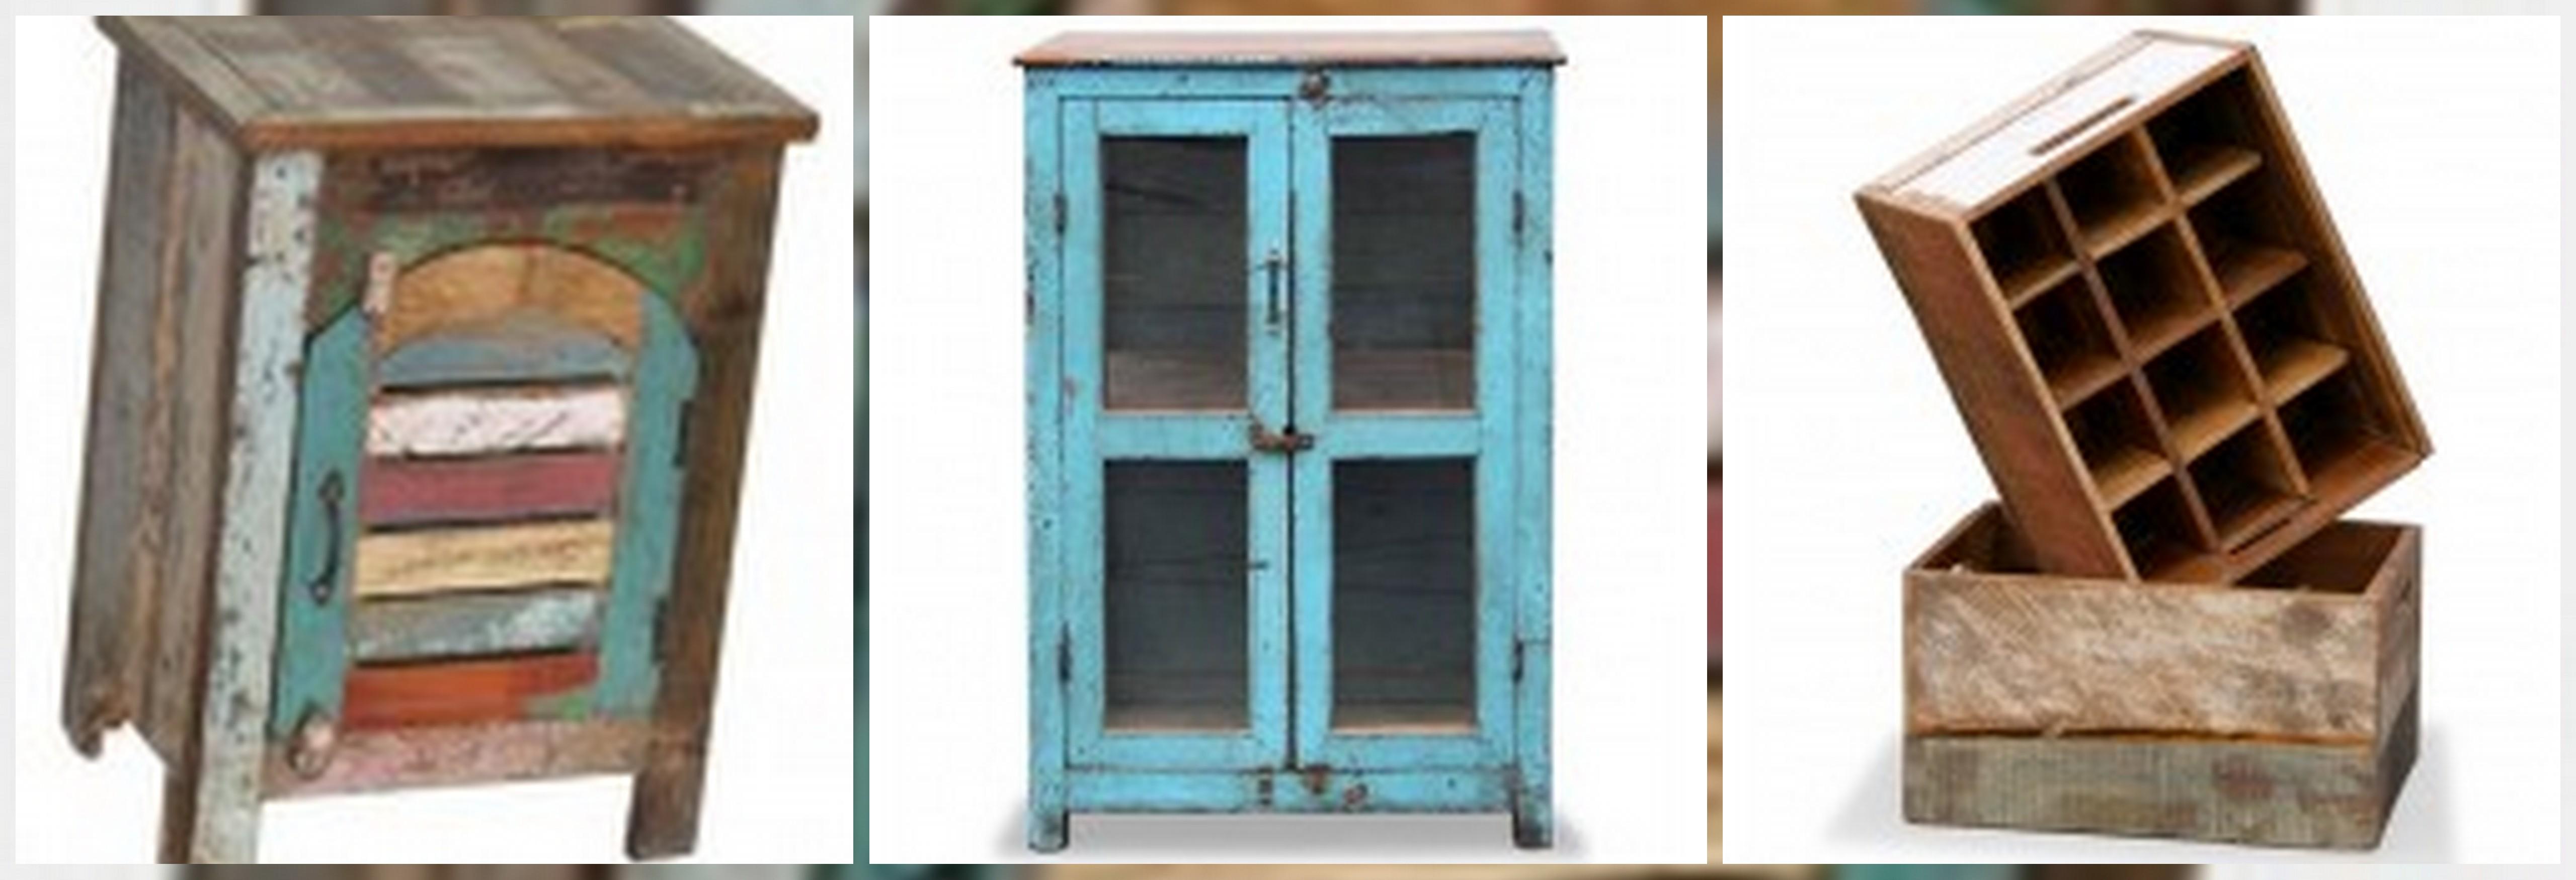 Oude meubels herleven! - Maison Belle